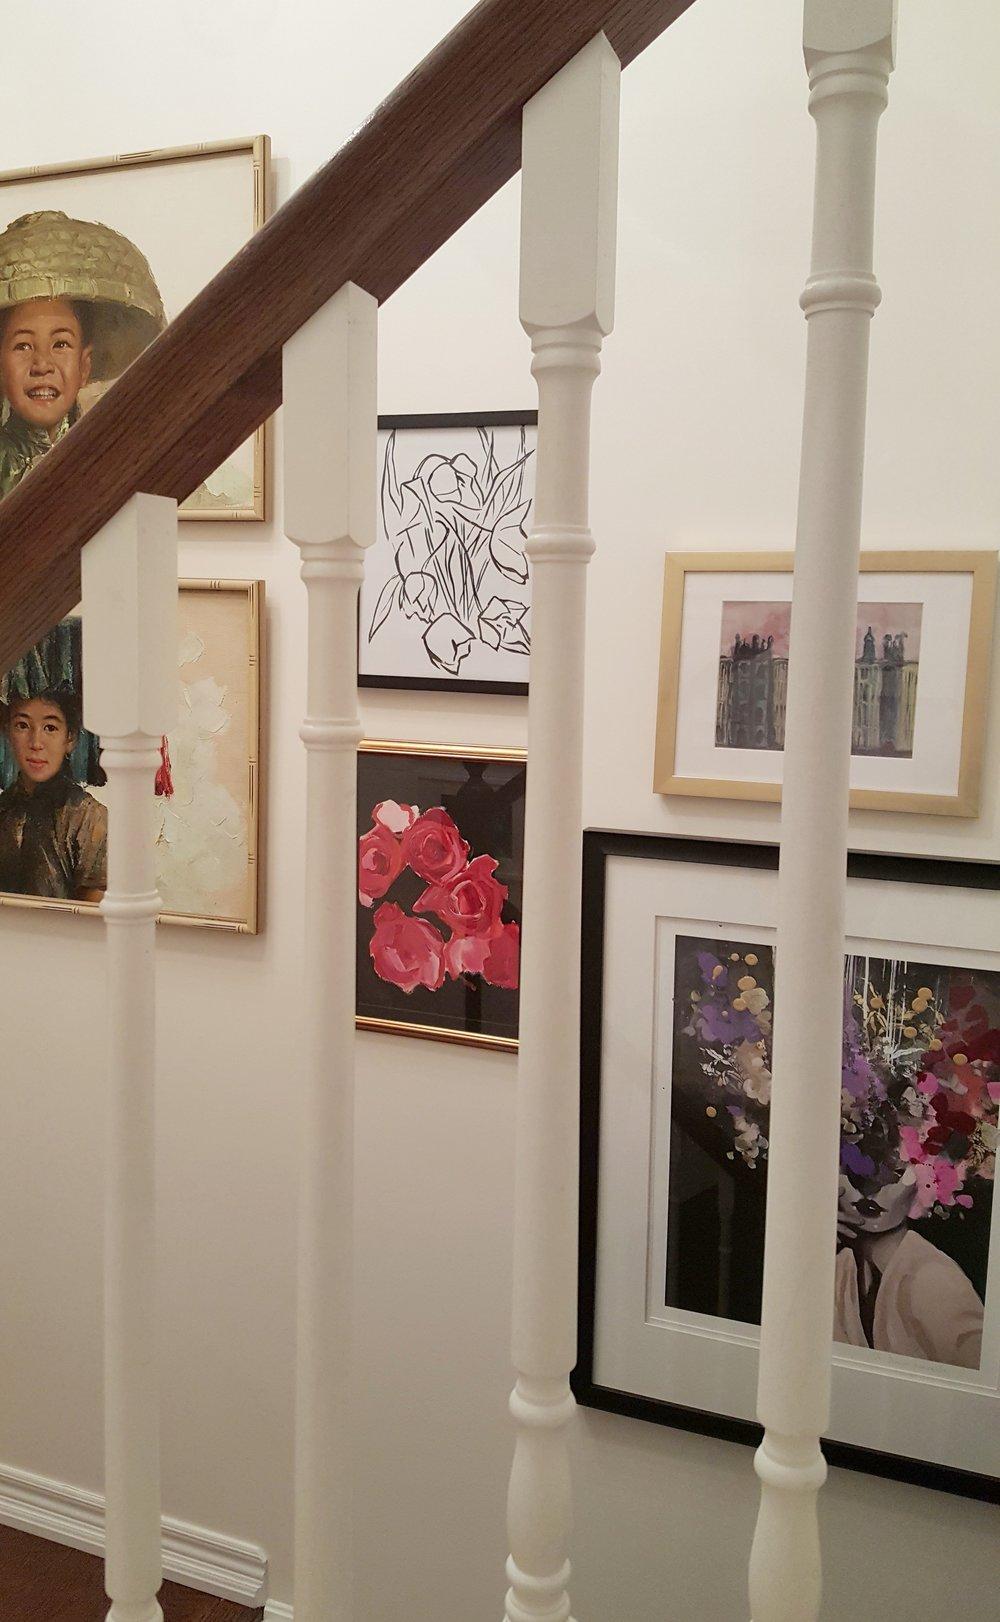 Spring 2018 One Room Challenge: Stairway Library & Gallery | Carley Brandon Designs